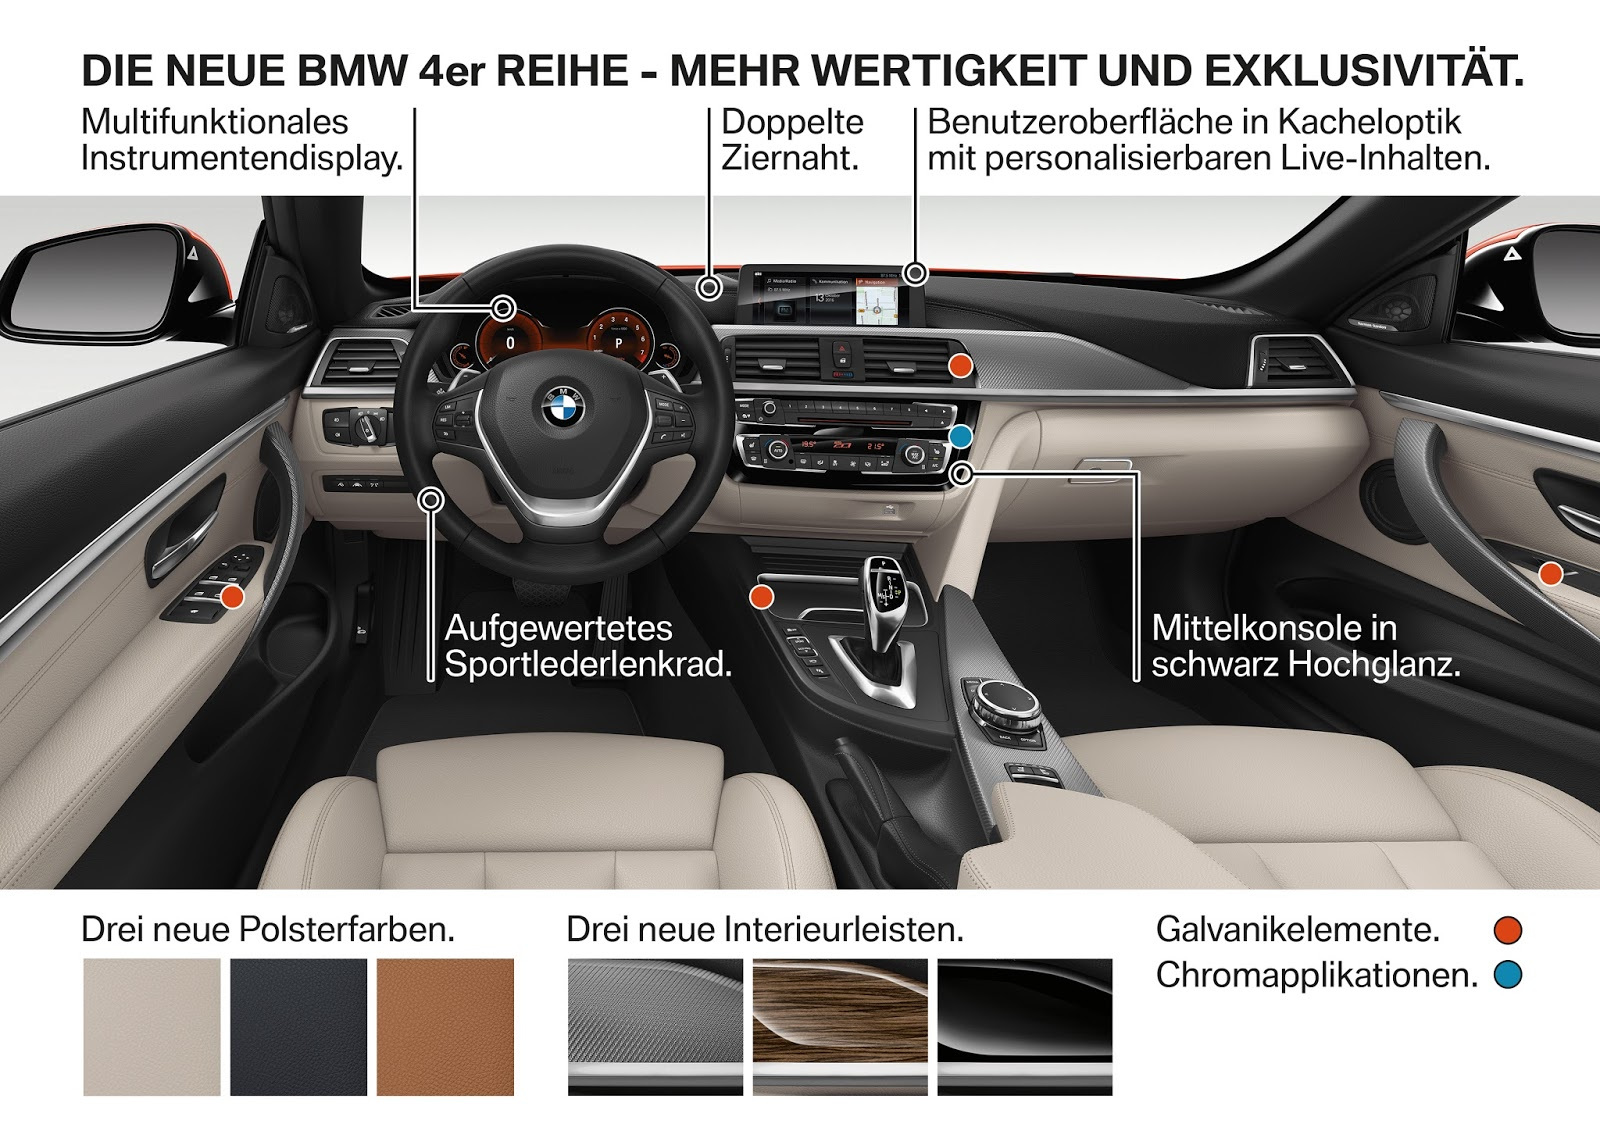 P90245355 highRes the new bmw 4 series Η νέα BMW Σειρά 4, με πιο σφιχτή ρύθμιση ανάρτησης BMW, Bmw 4, BMW 4 Cabrio, BMW 4 Coupe, BMW 4 Gran Coupé, Facelift